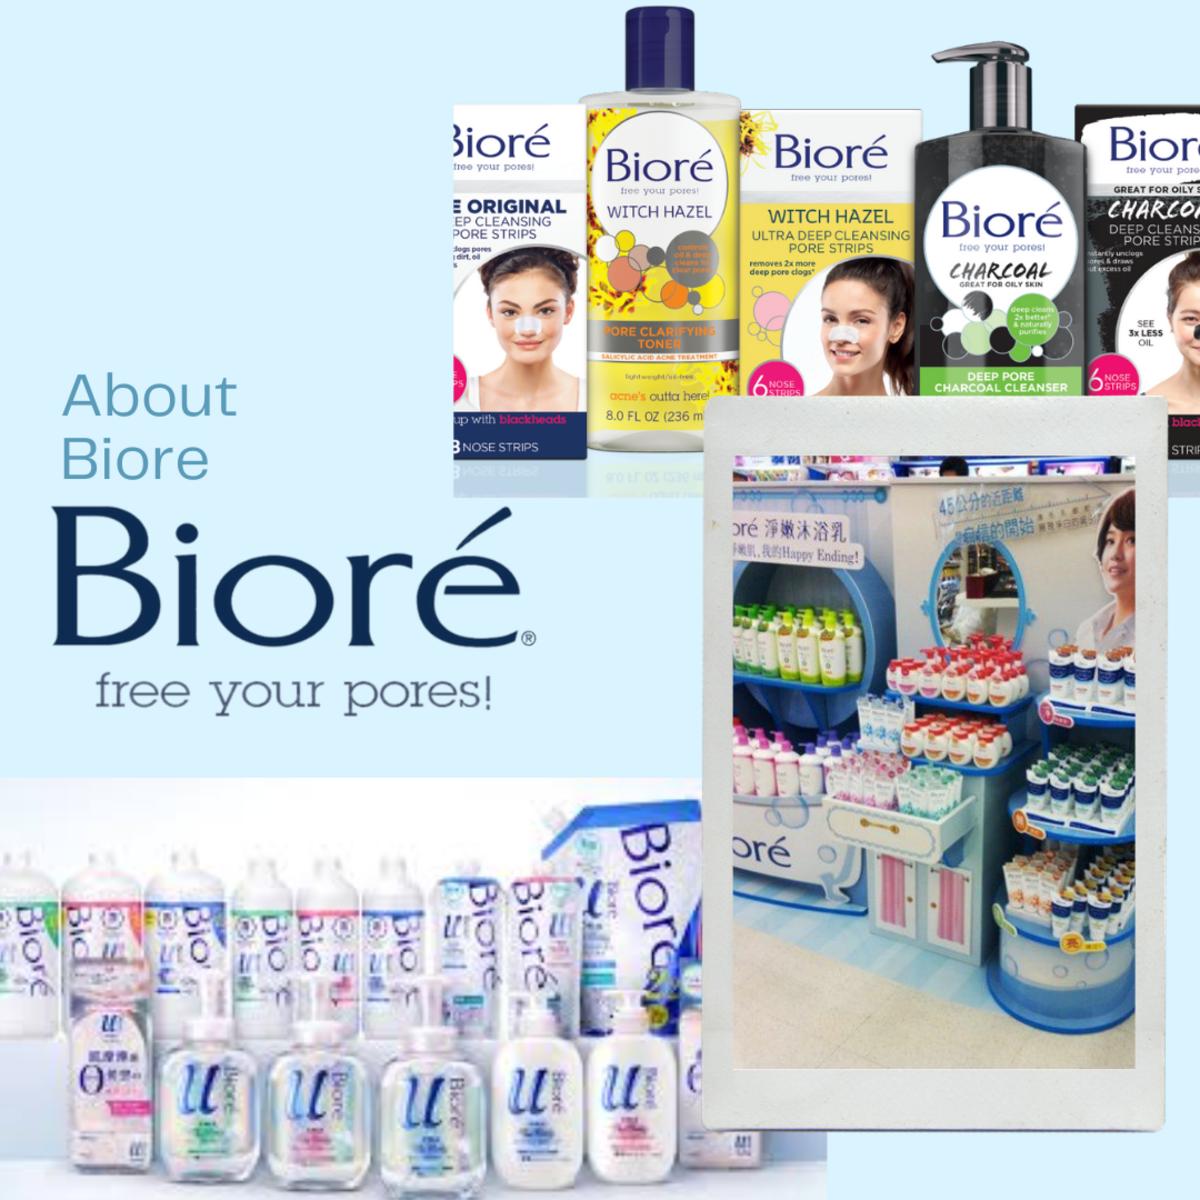 biore-uv-watery-essence-spf-50-pa-review